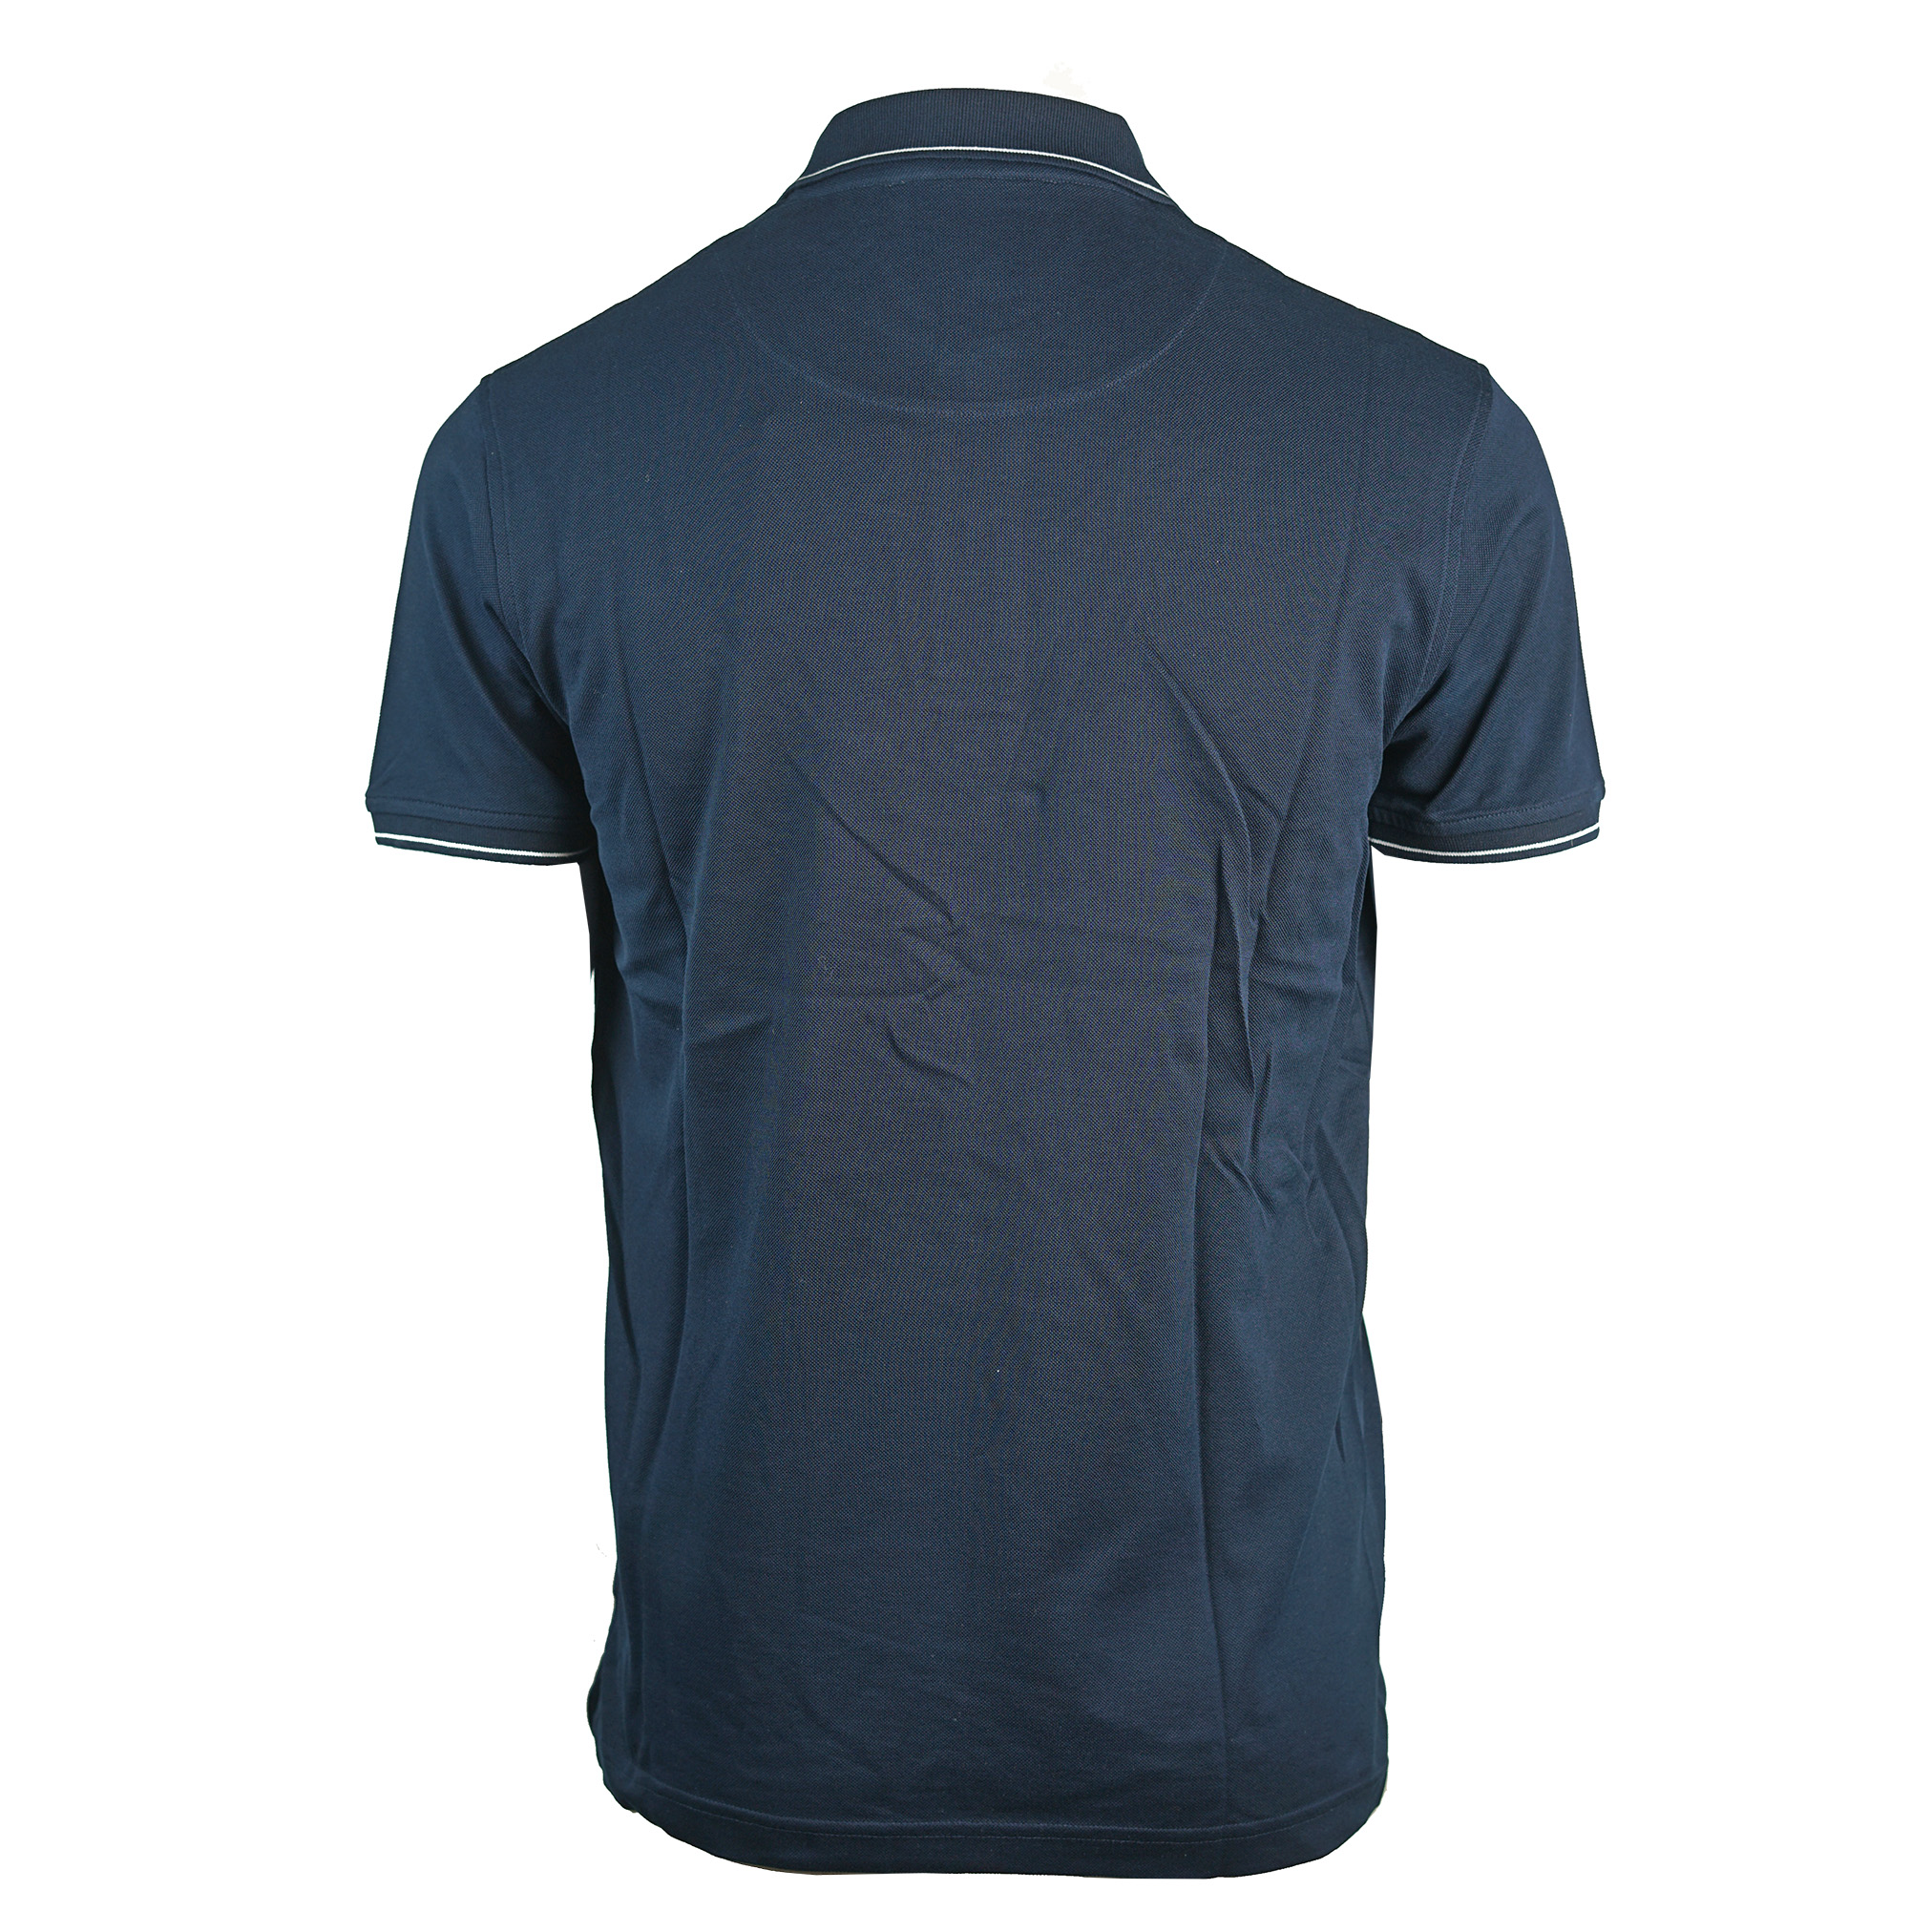 503a1fc16 Details about Roberto Cavalli FSR602 KB005 Polo Shirt